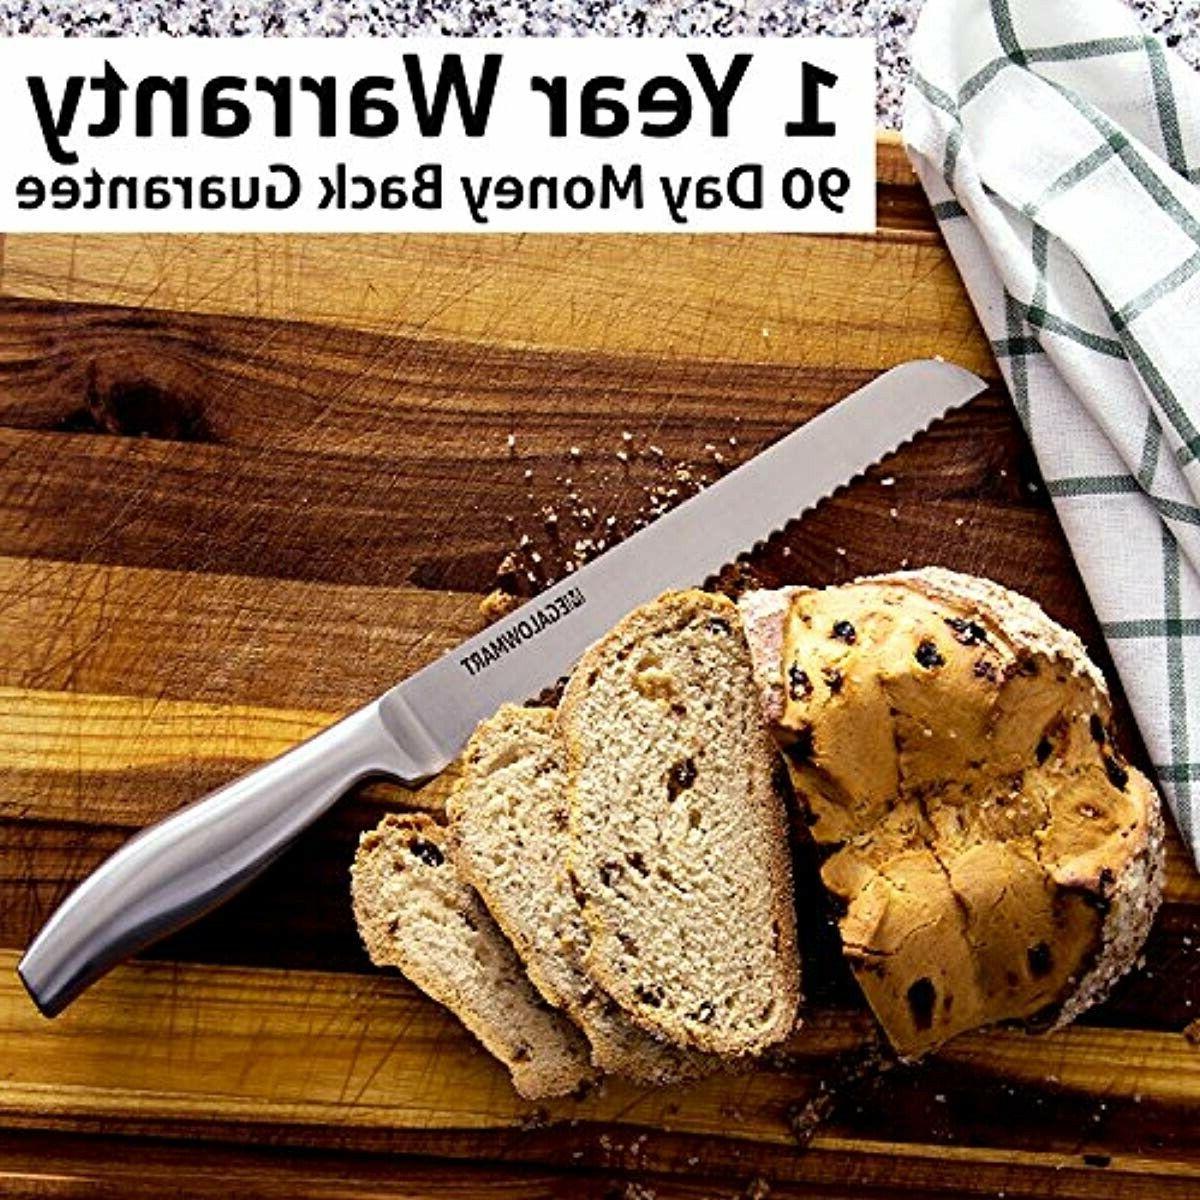 Premium Knife w/ Knives